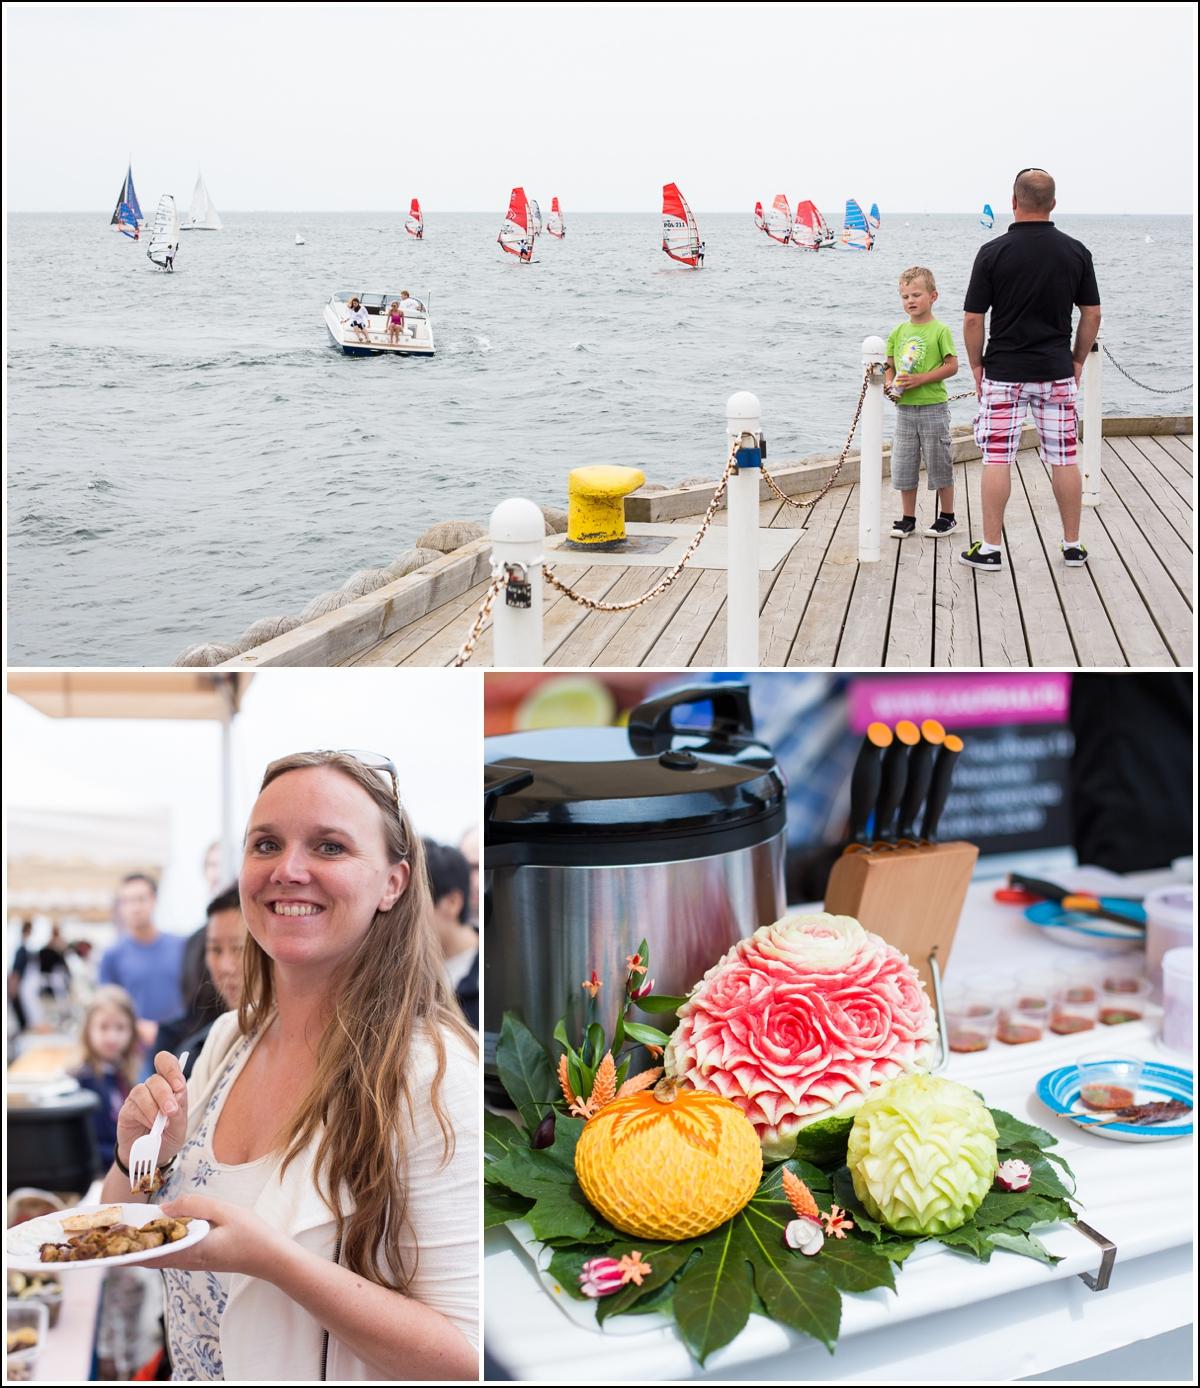 food-festival-sopot-boat